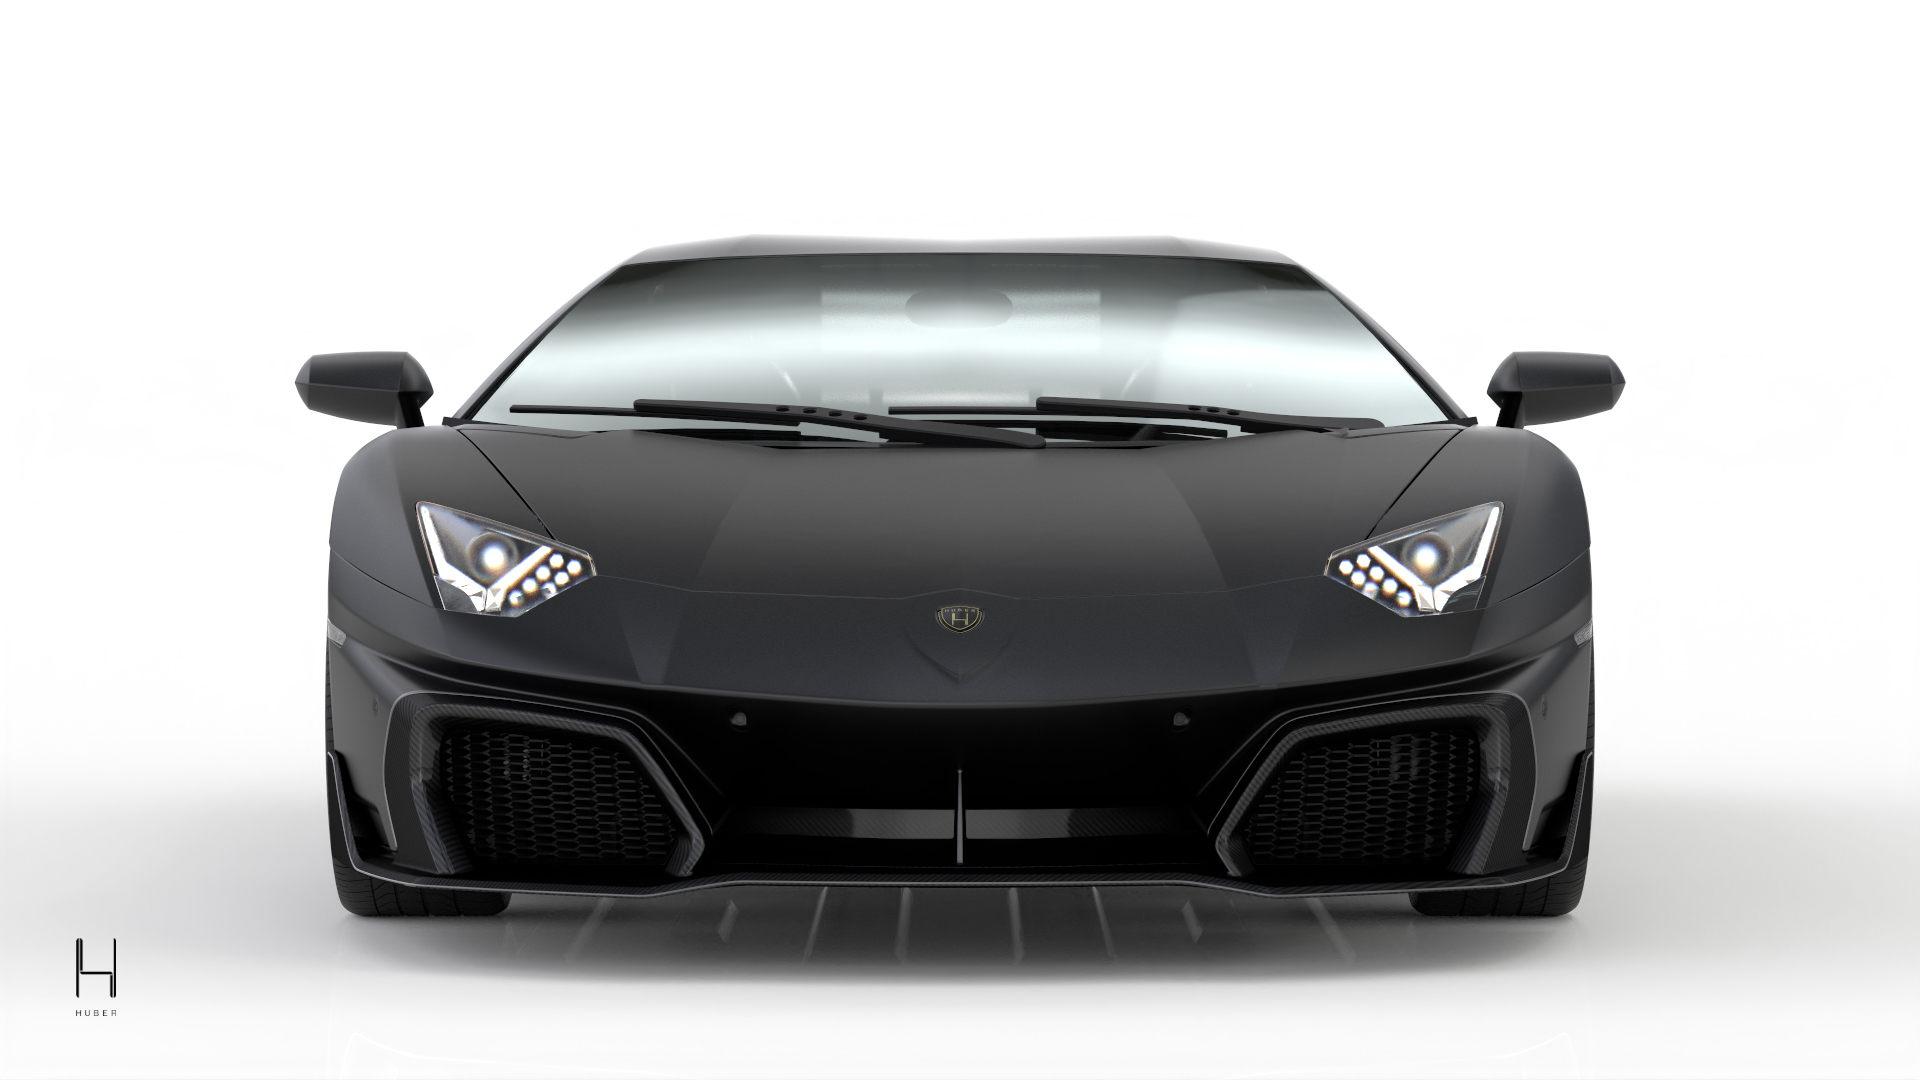 Lamborghini-Aventador-by-Huber-3